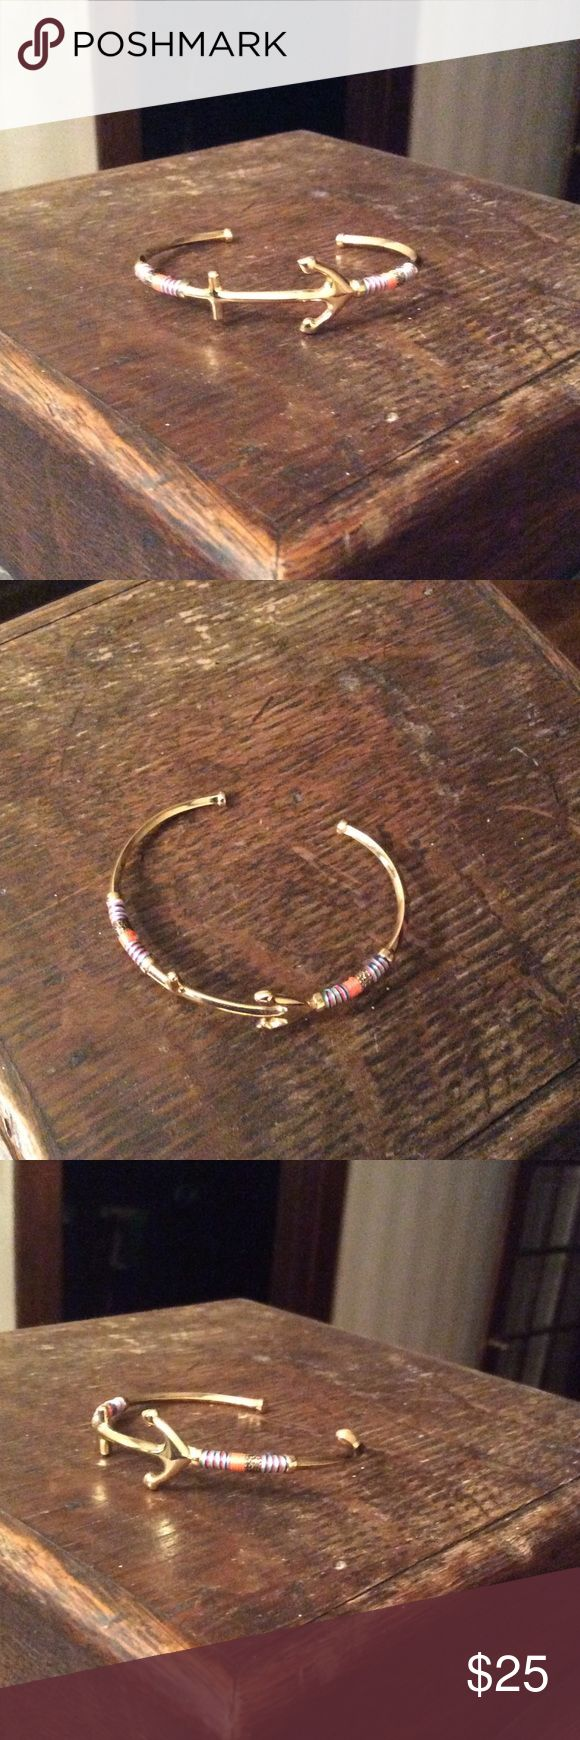 Anchor bracelet Stella & dot Beautiful dainty anchor bracelet by Stella & Dot. Stella & Dot Jewelry Bracelets